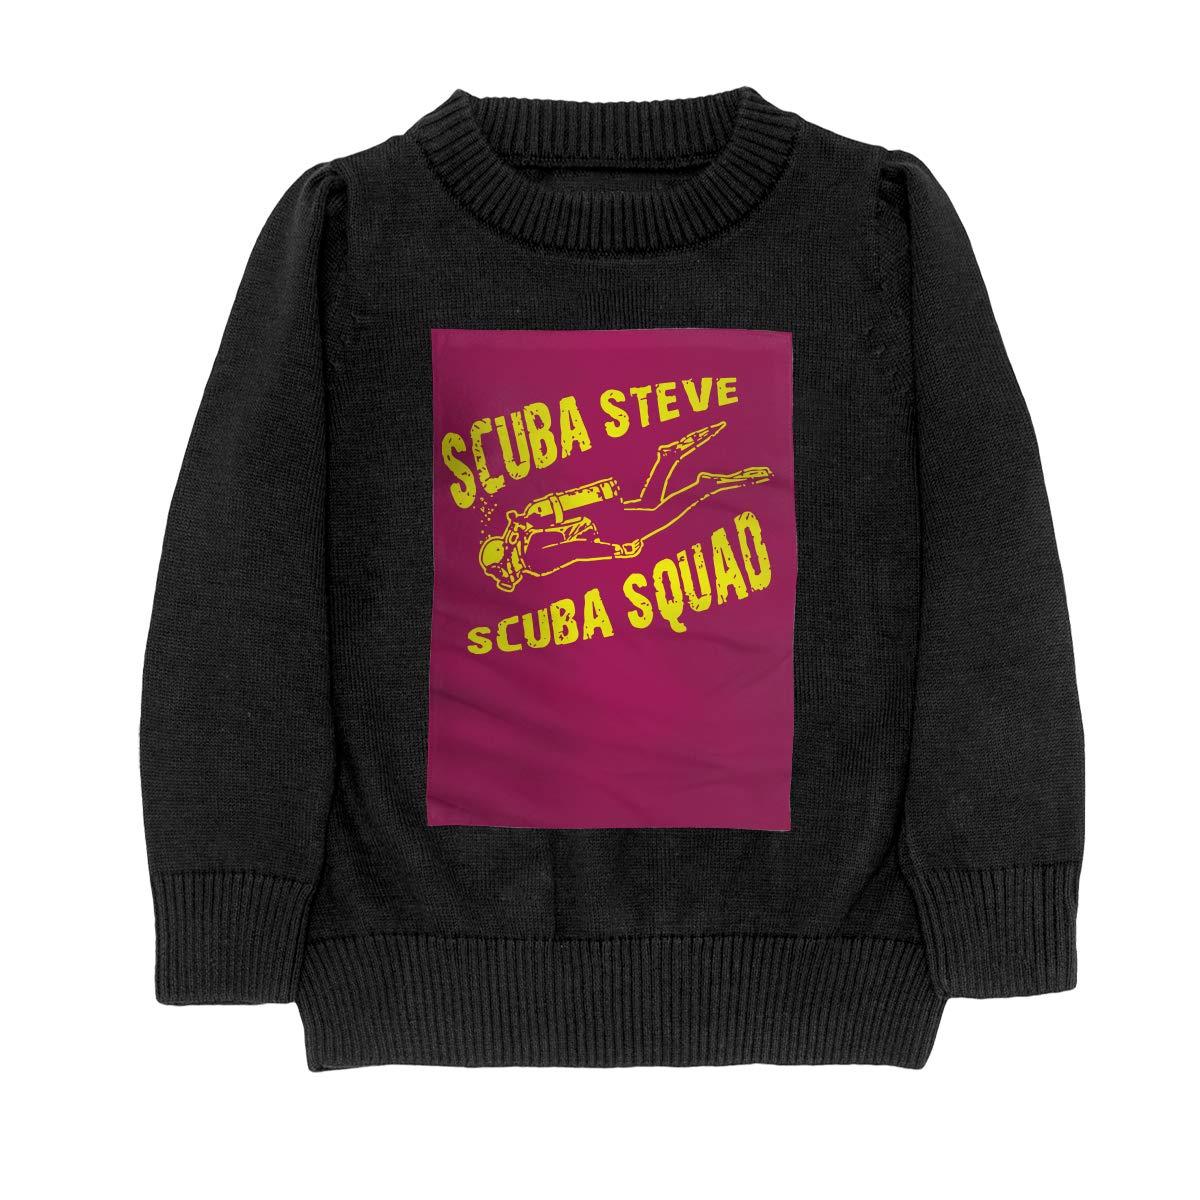 WWTBBJ-B Scuba Steve Scuba Squad Fashion Adolescent Boys Girls Unisex Sweater Keep Warm